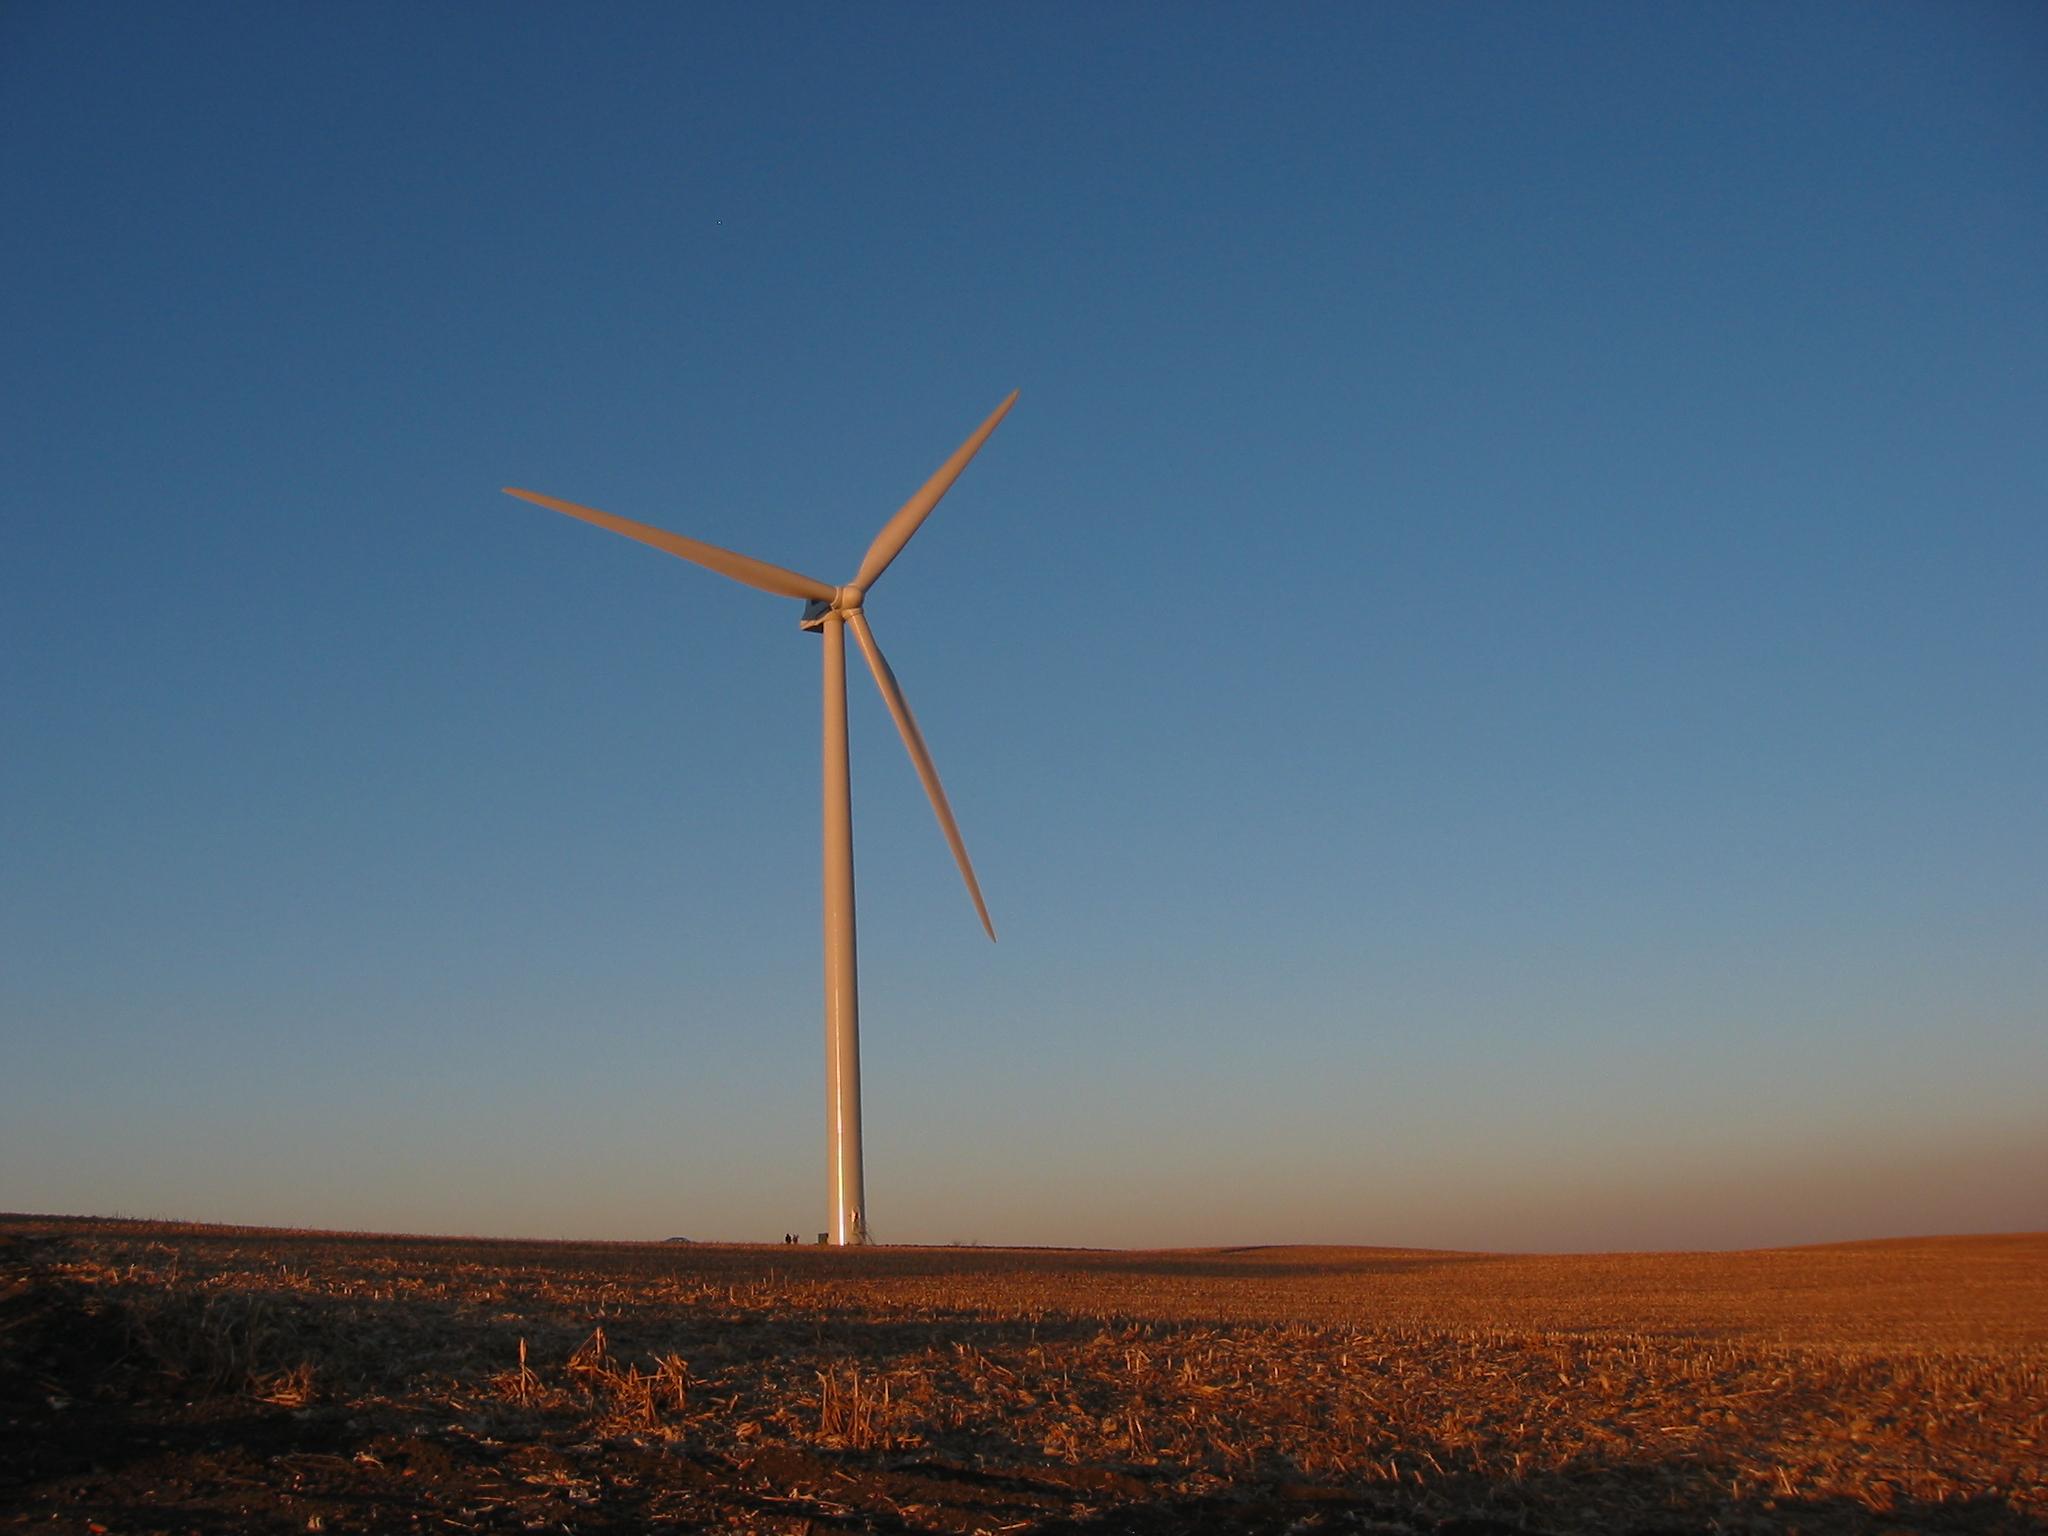 Carleton_Turbine_XII_11-04.JPG